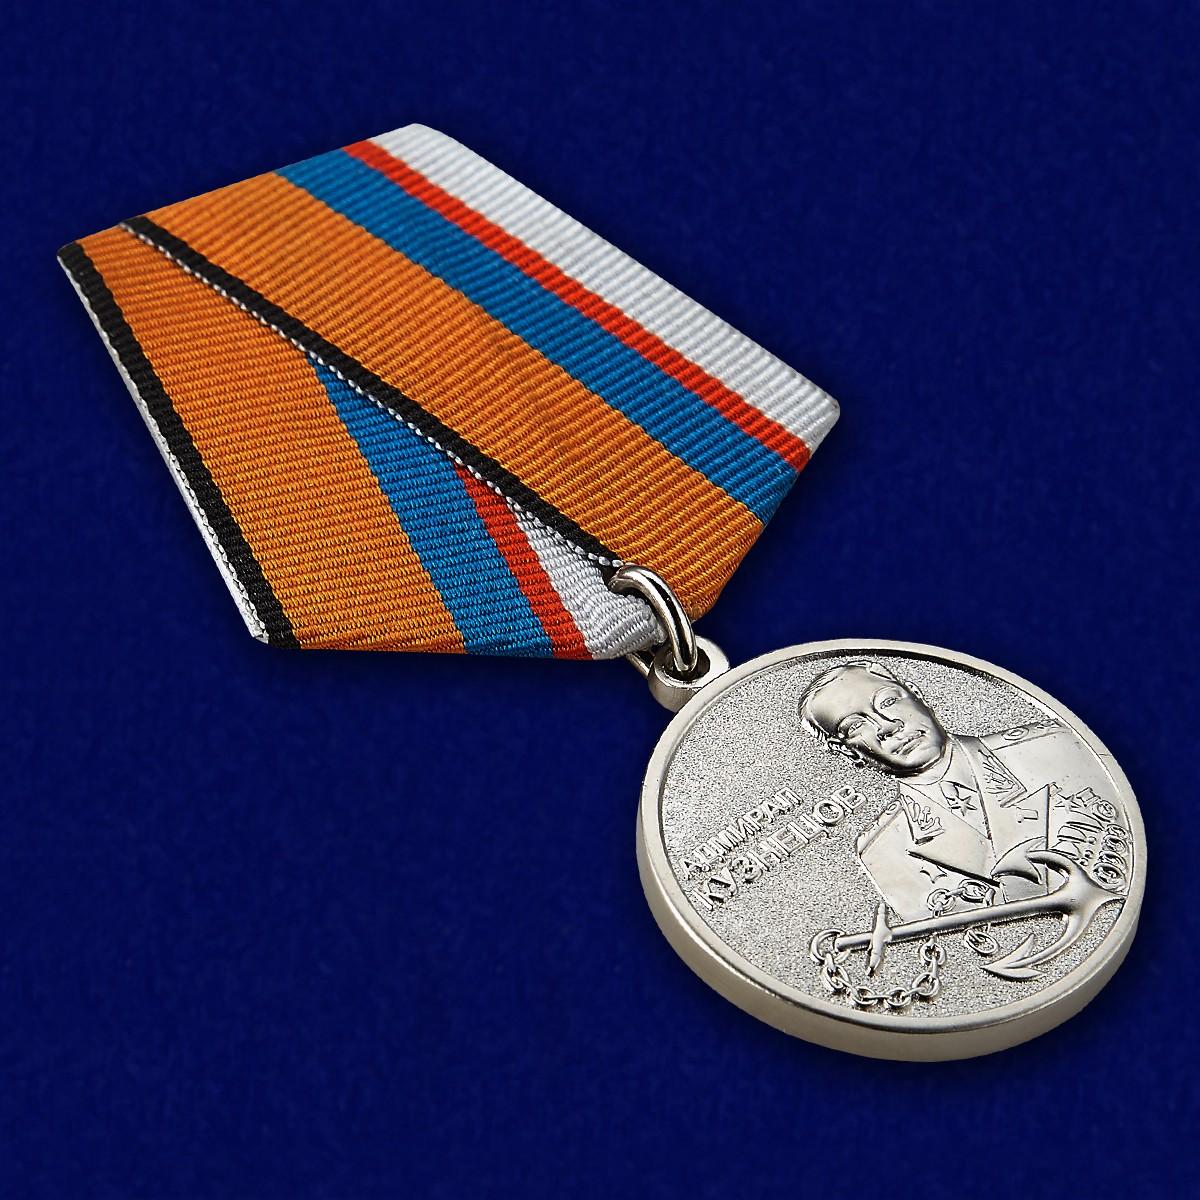 Медаль Адмирал Кузнецов - вид под углом